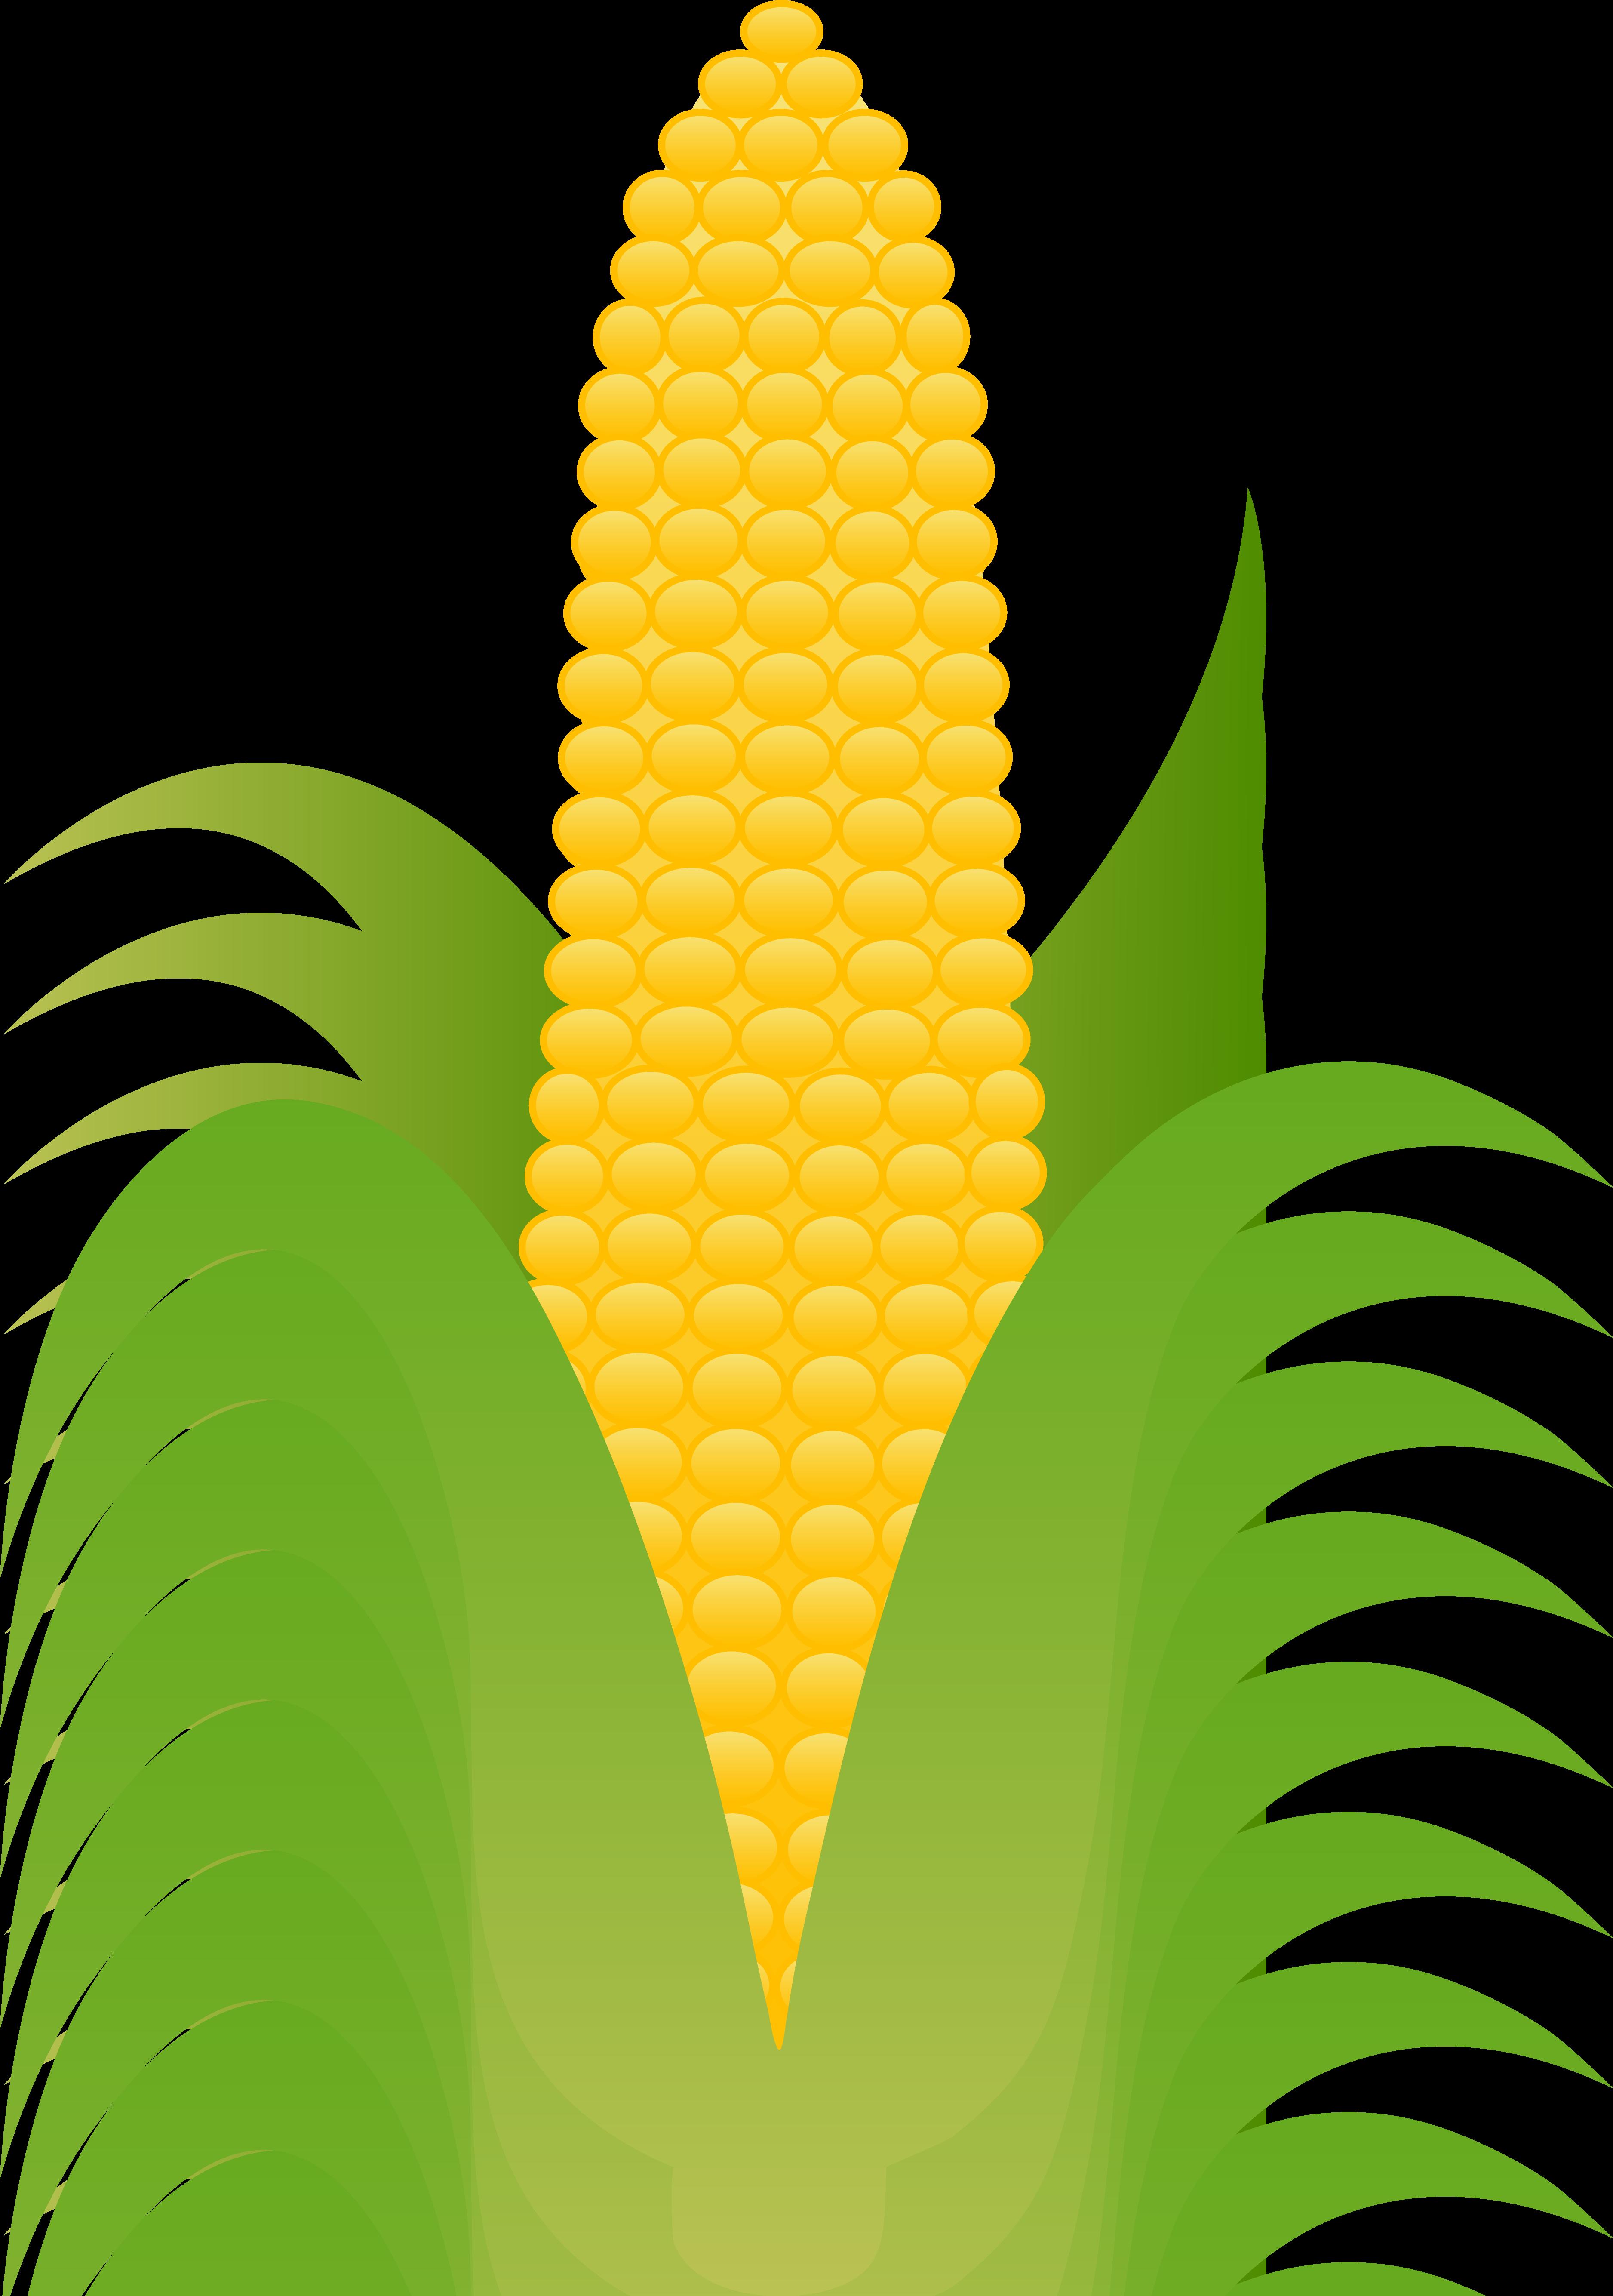 Drawn korn cob clip art Yellow Corn Yellow Ear Free